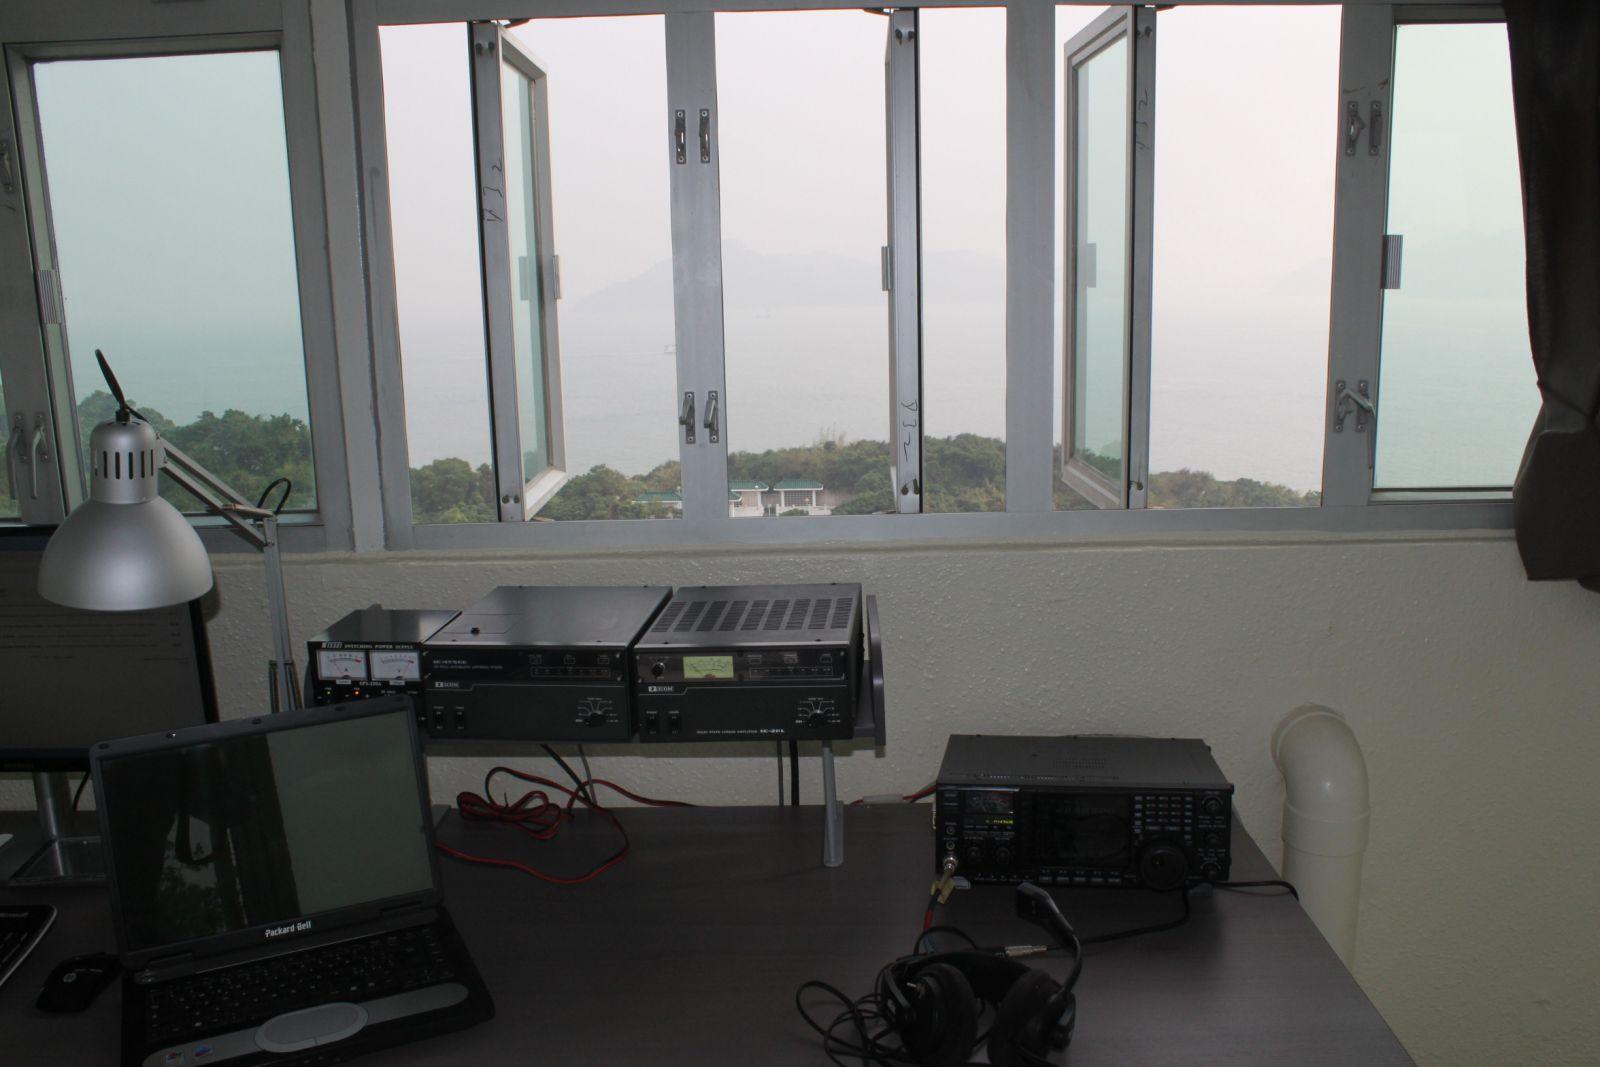 Peng Chau Island VR2/IV3TAN